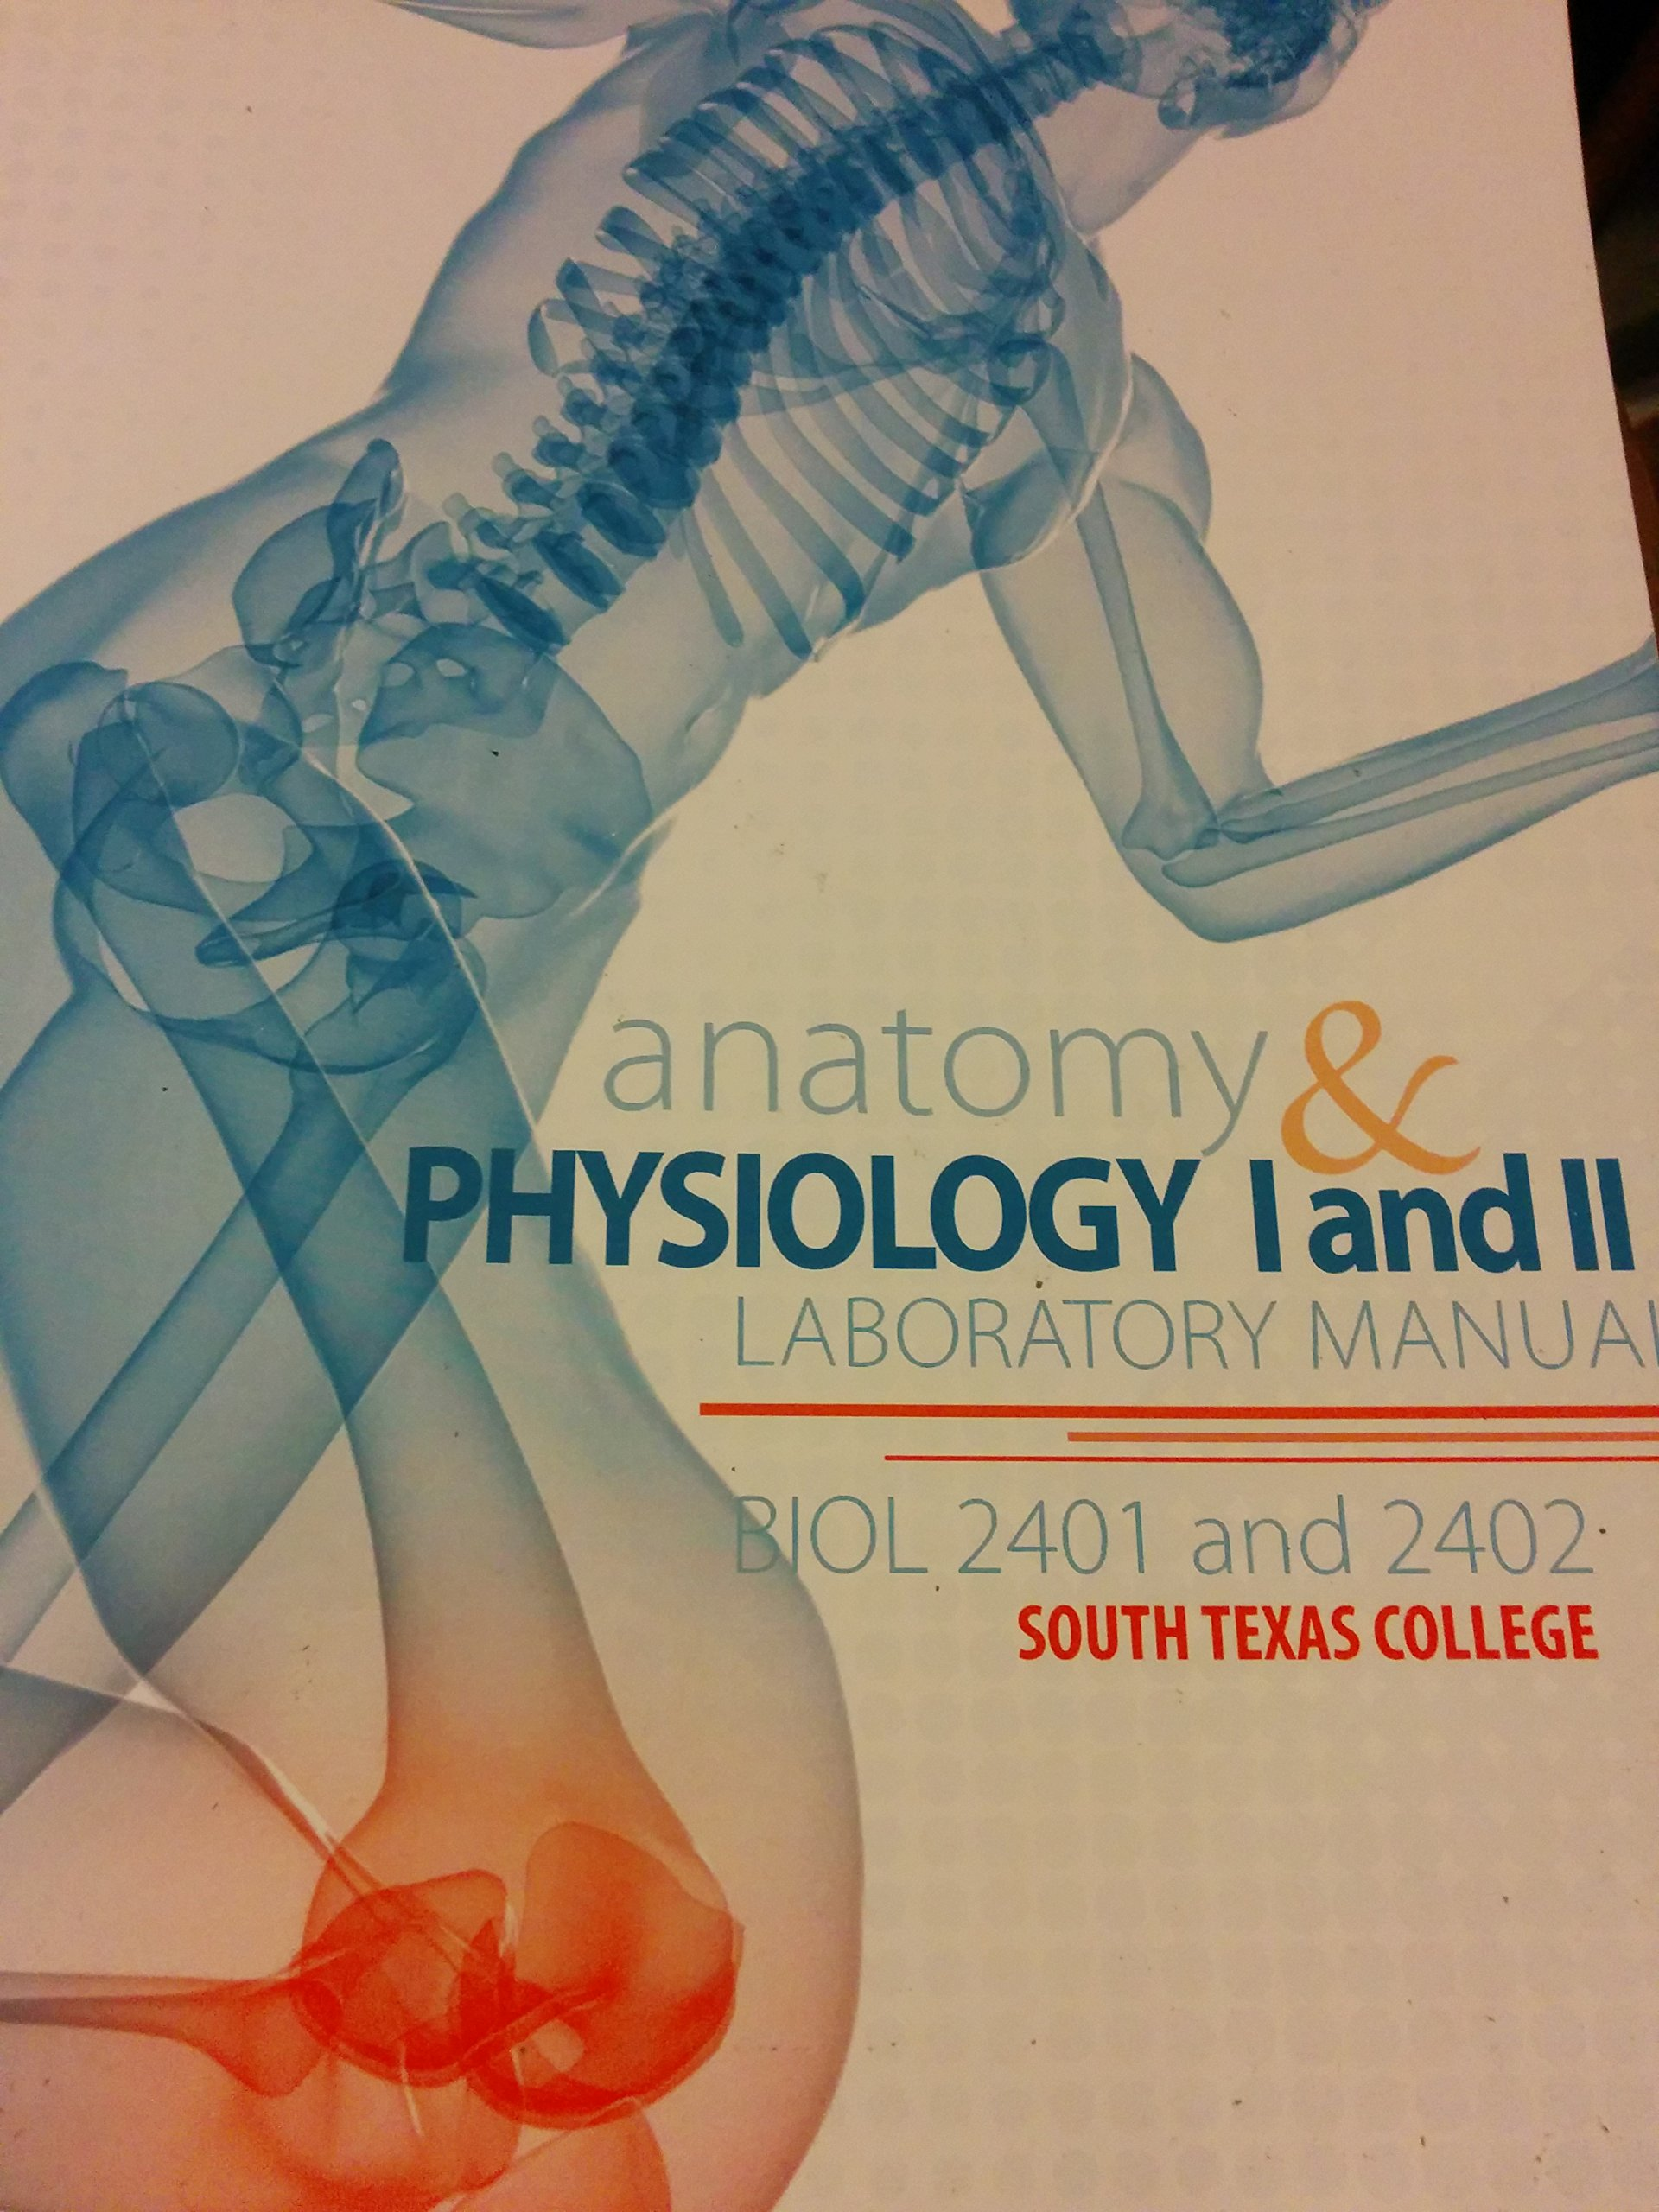 Anatomy & physiology I and II laboratory manual Biol 2401 and 2402 ...